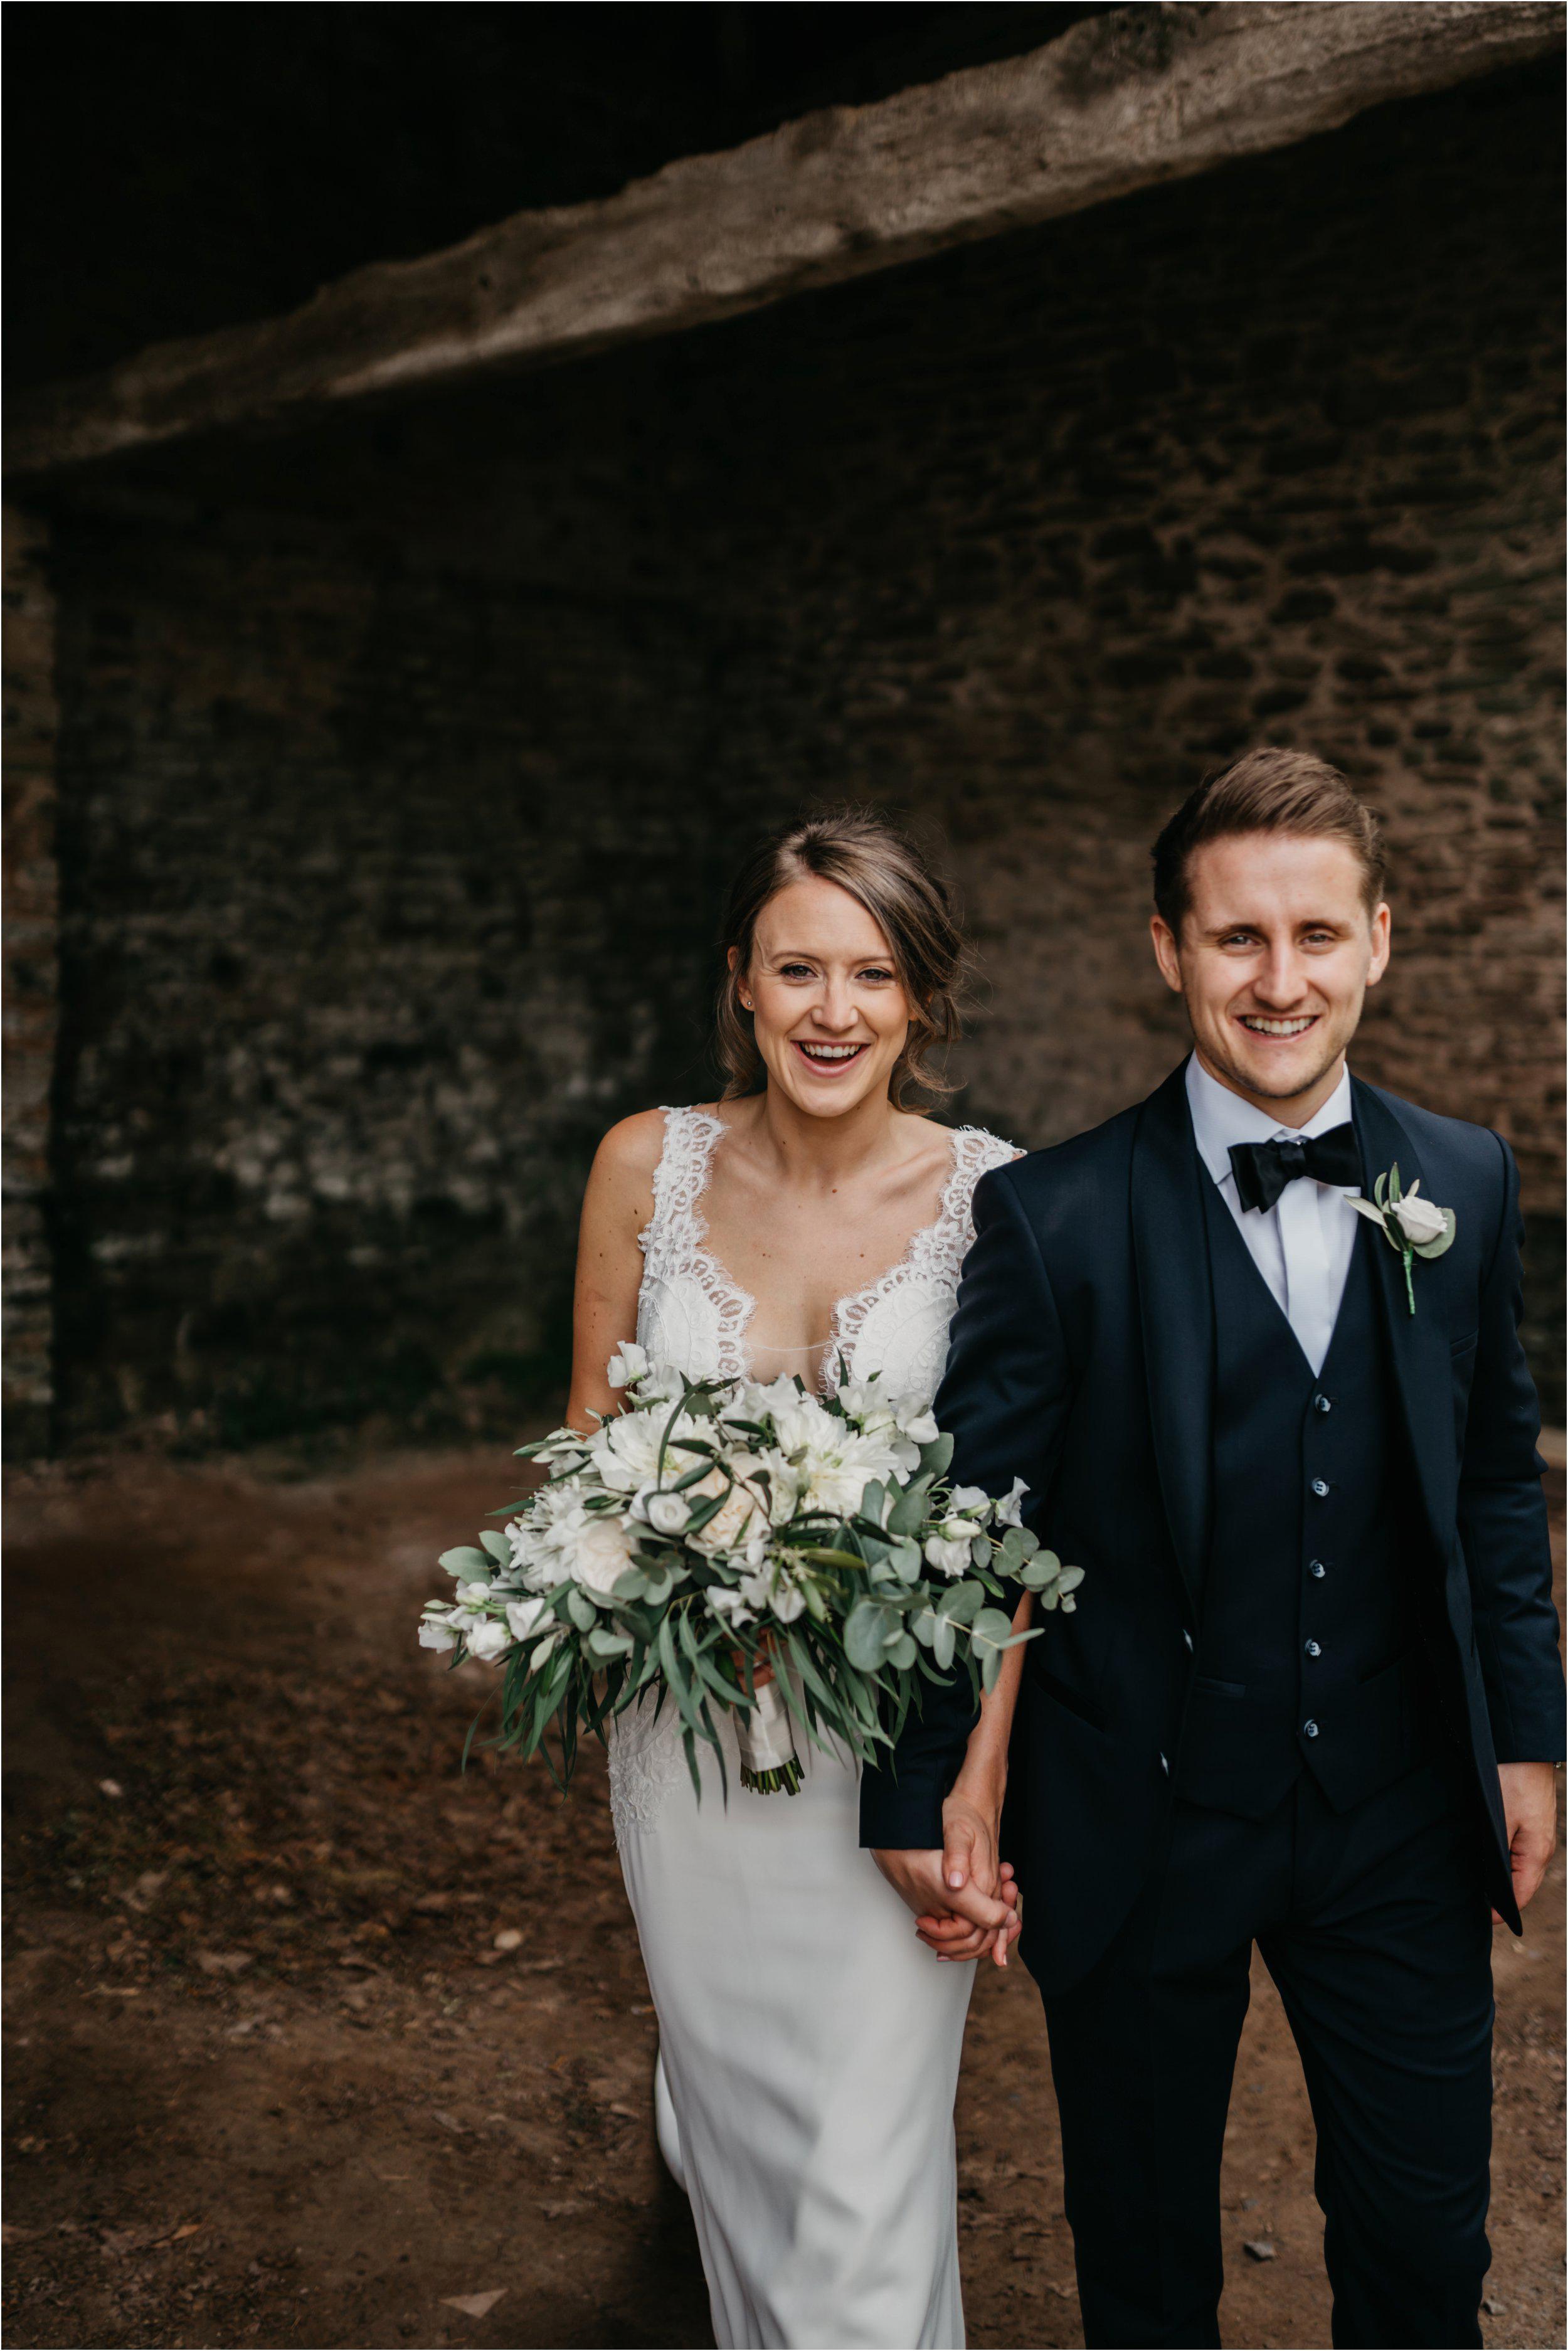 Dewsall Court Herefordshire wedding photographer_0085.jpg